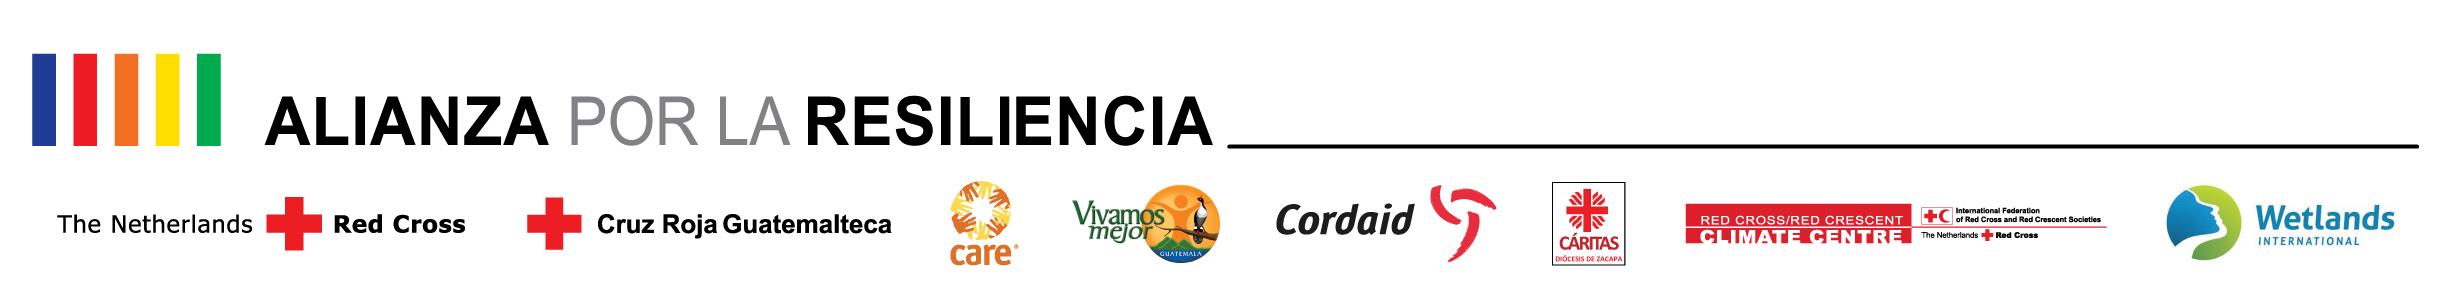 Logotipo Alianza PfR socios globales-04